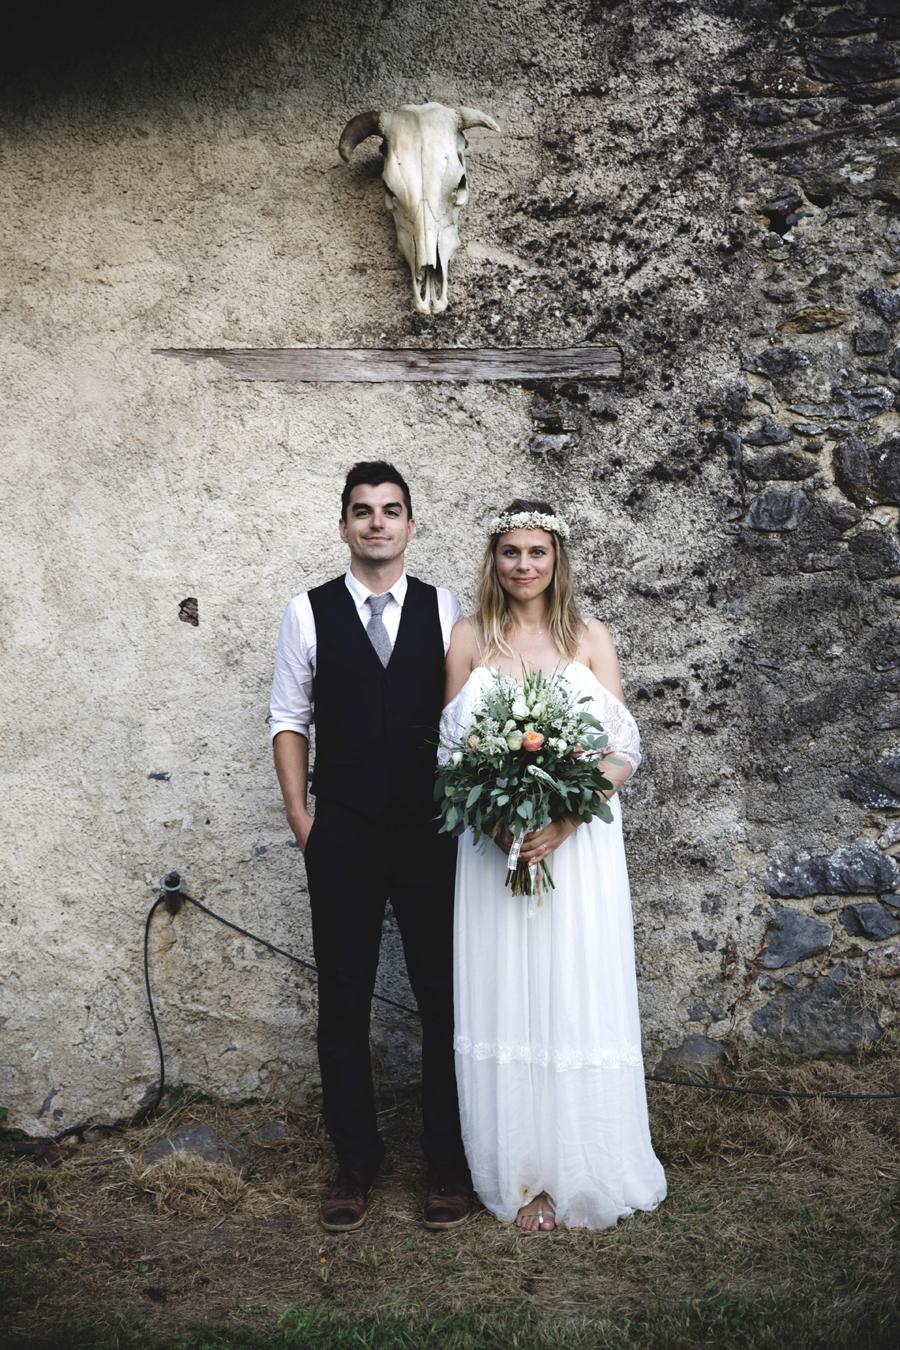 celine_marks_mariage_aurelie_keil_151